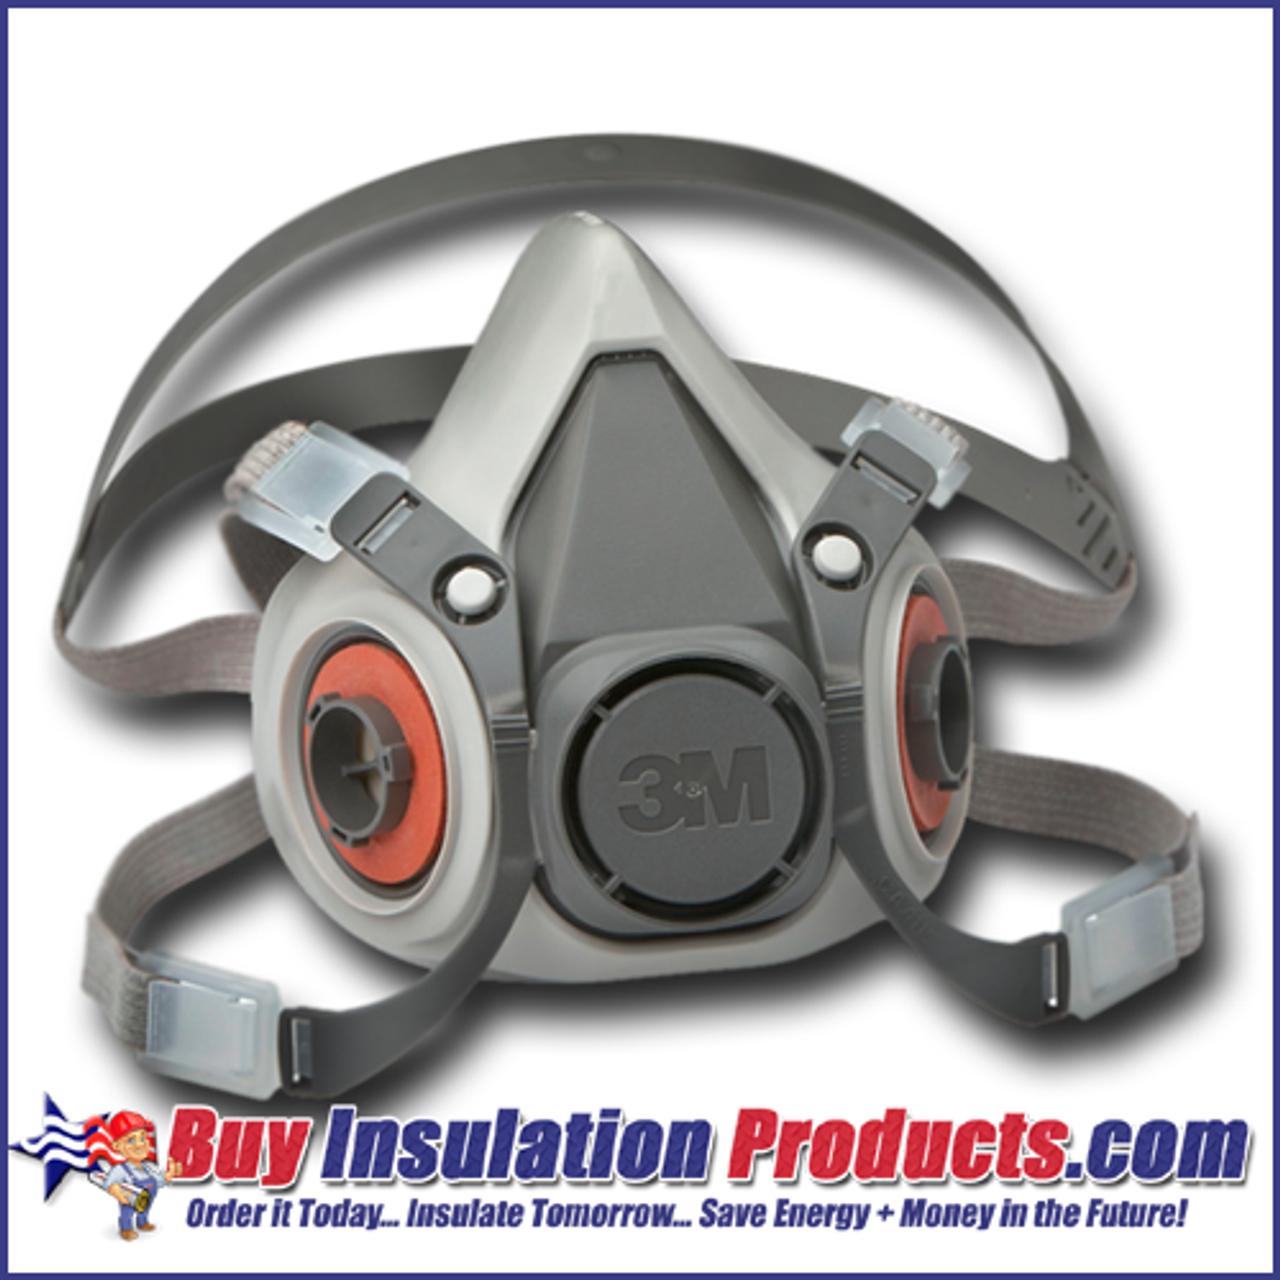 3m 6000 series half mask asbestos abatement respirator